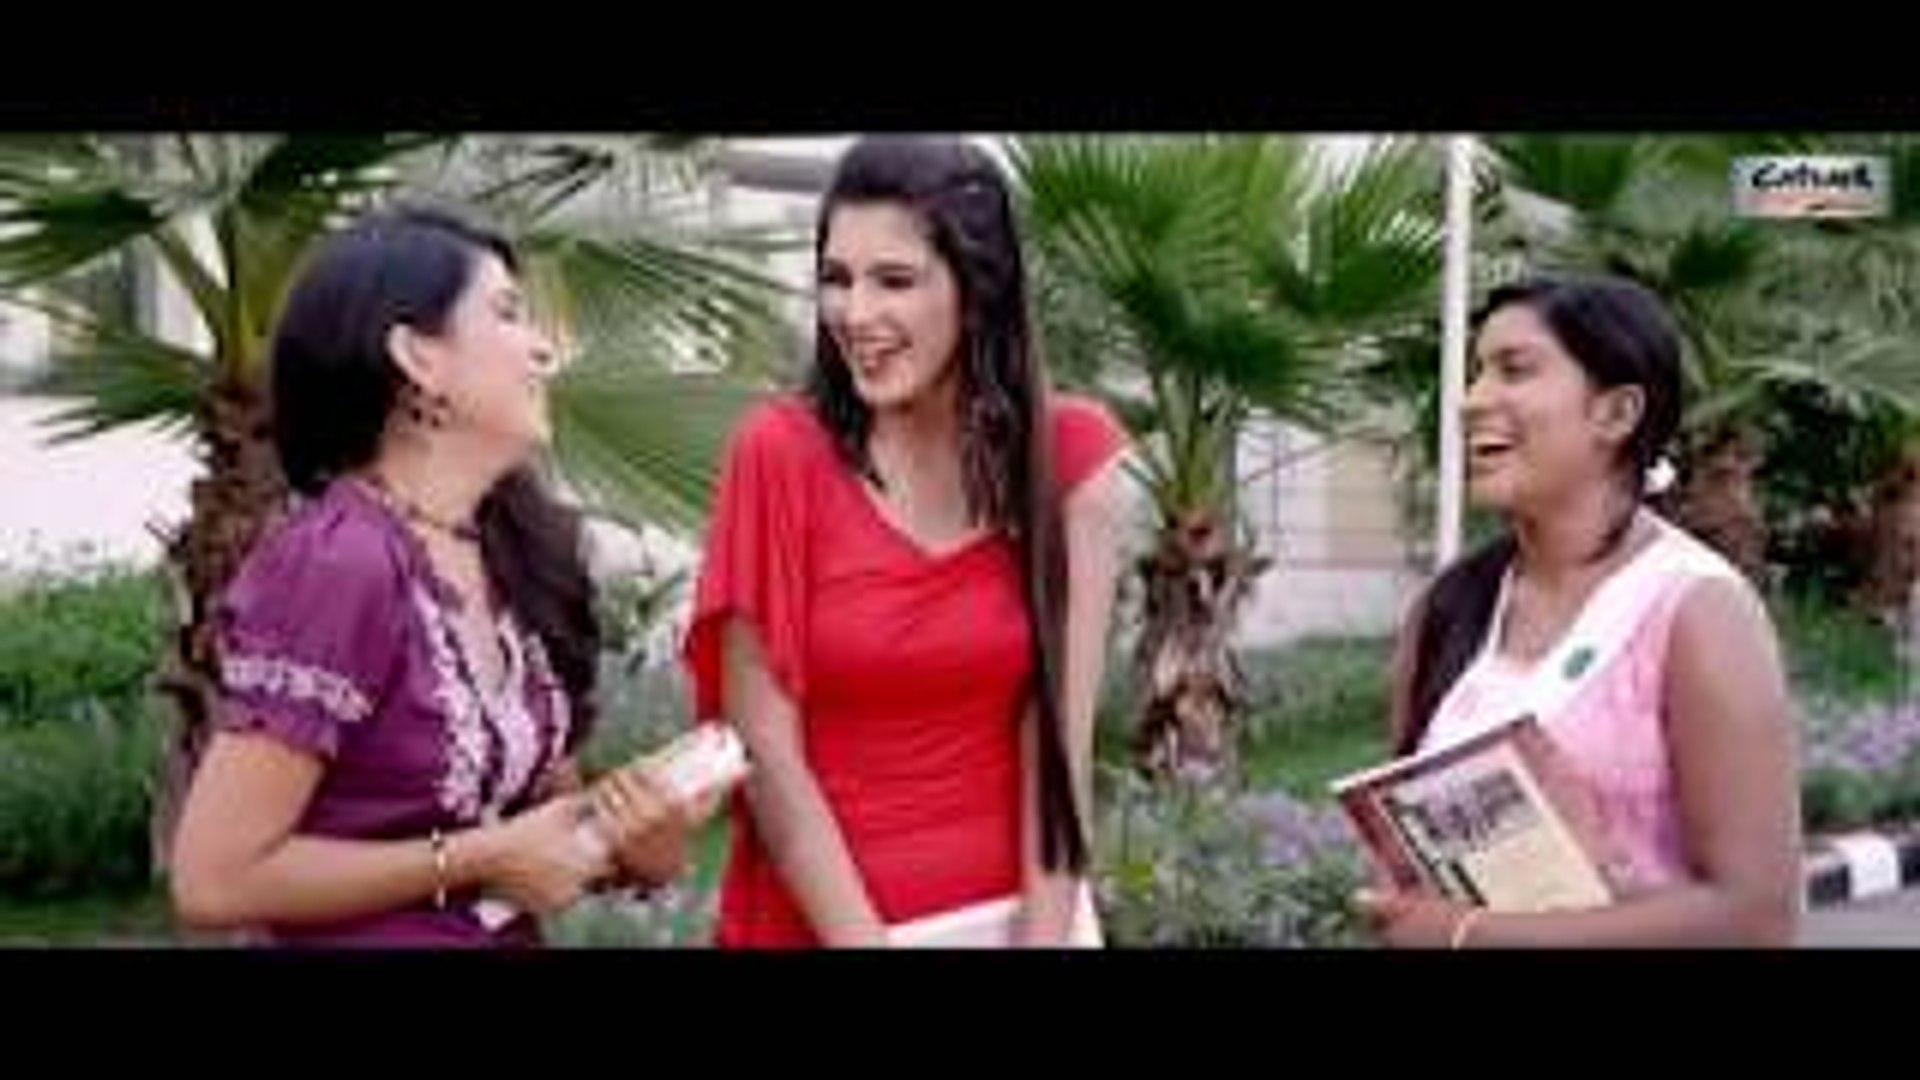 Idiot Boys - Best Full Punjabi Movie - Popular Indian Movies - Meet Surmeet, Alisha